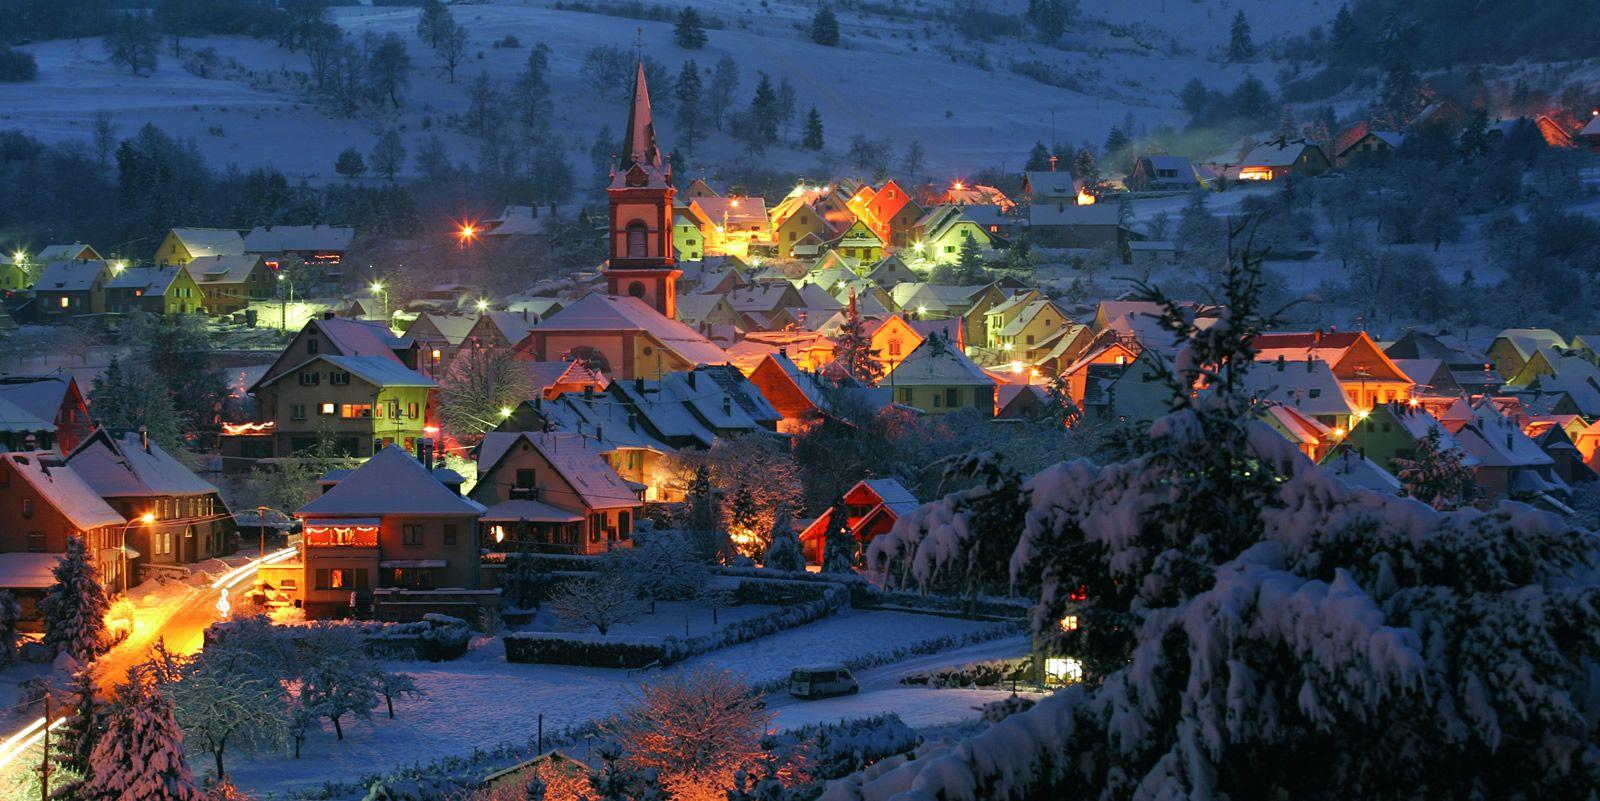 Winter In Colmar Alsace France Sejour Hiver Alsace Week End